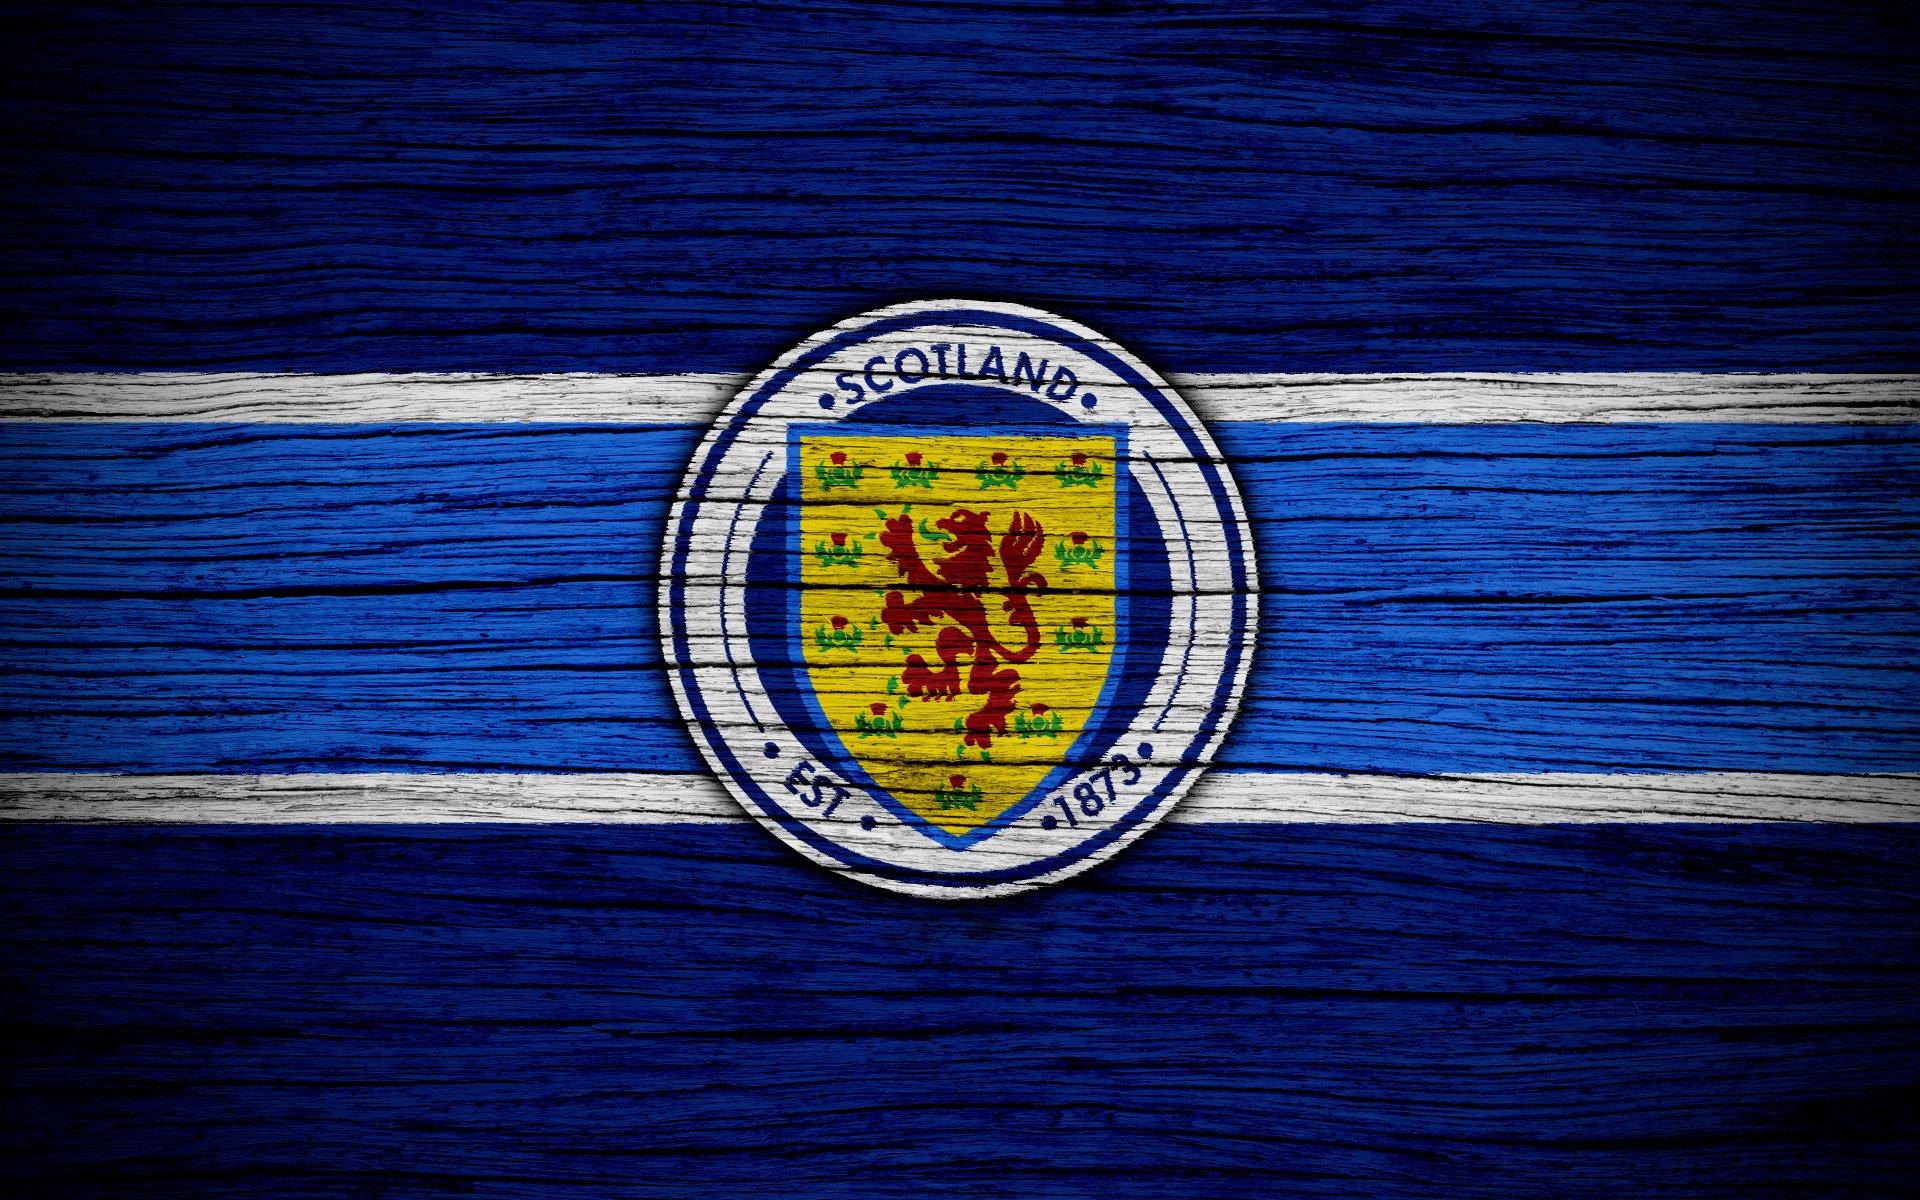 Scotland National Football Team Zoom Background 3